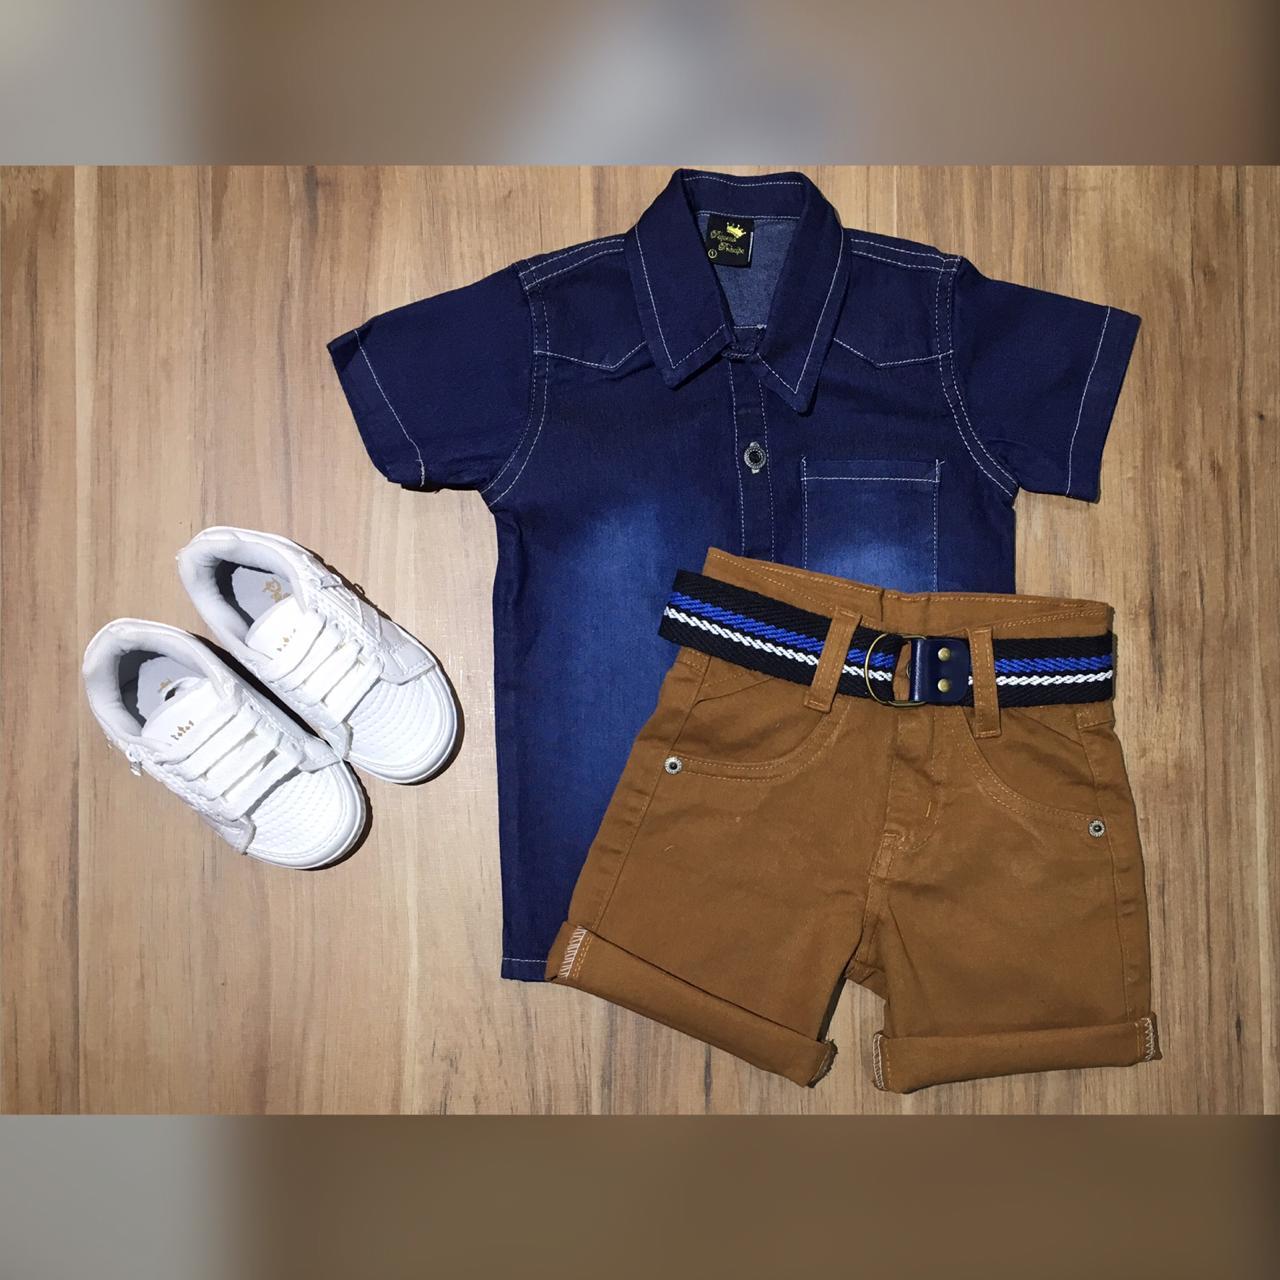 Bermuda Marrom com Camisa Jeans